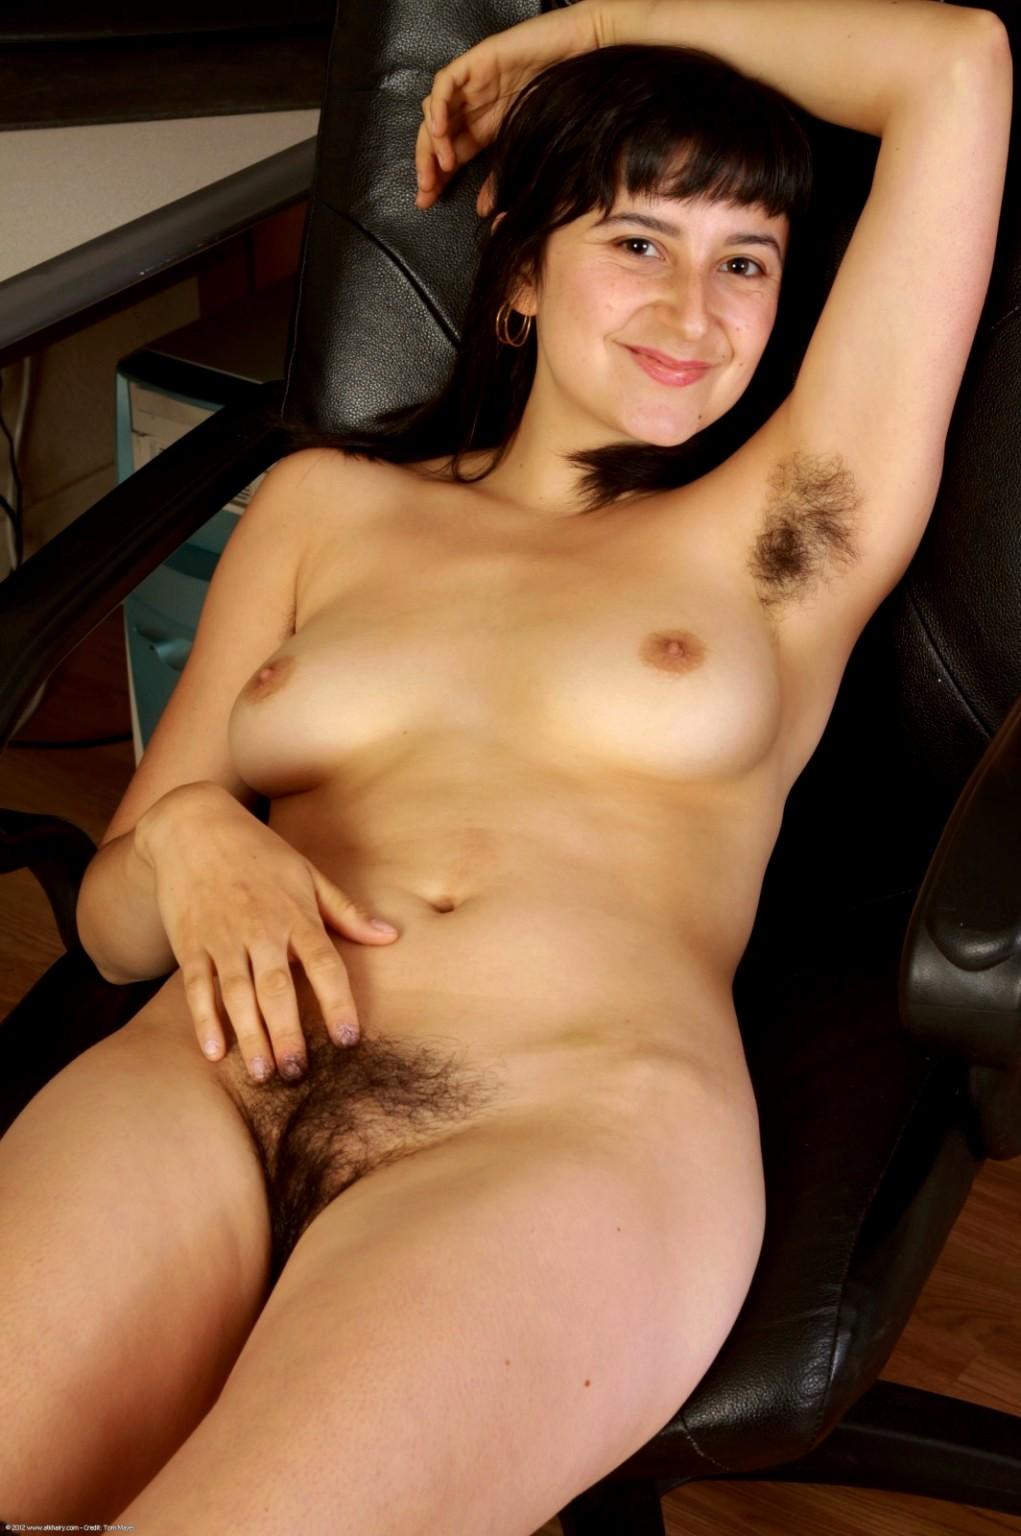 Sexy Hairy Pics